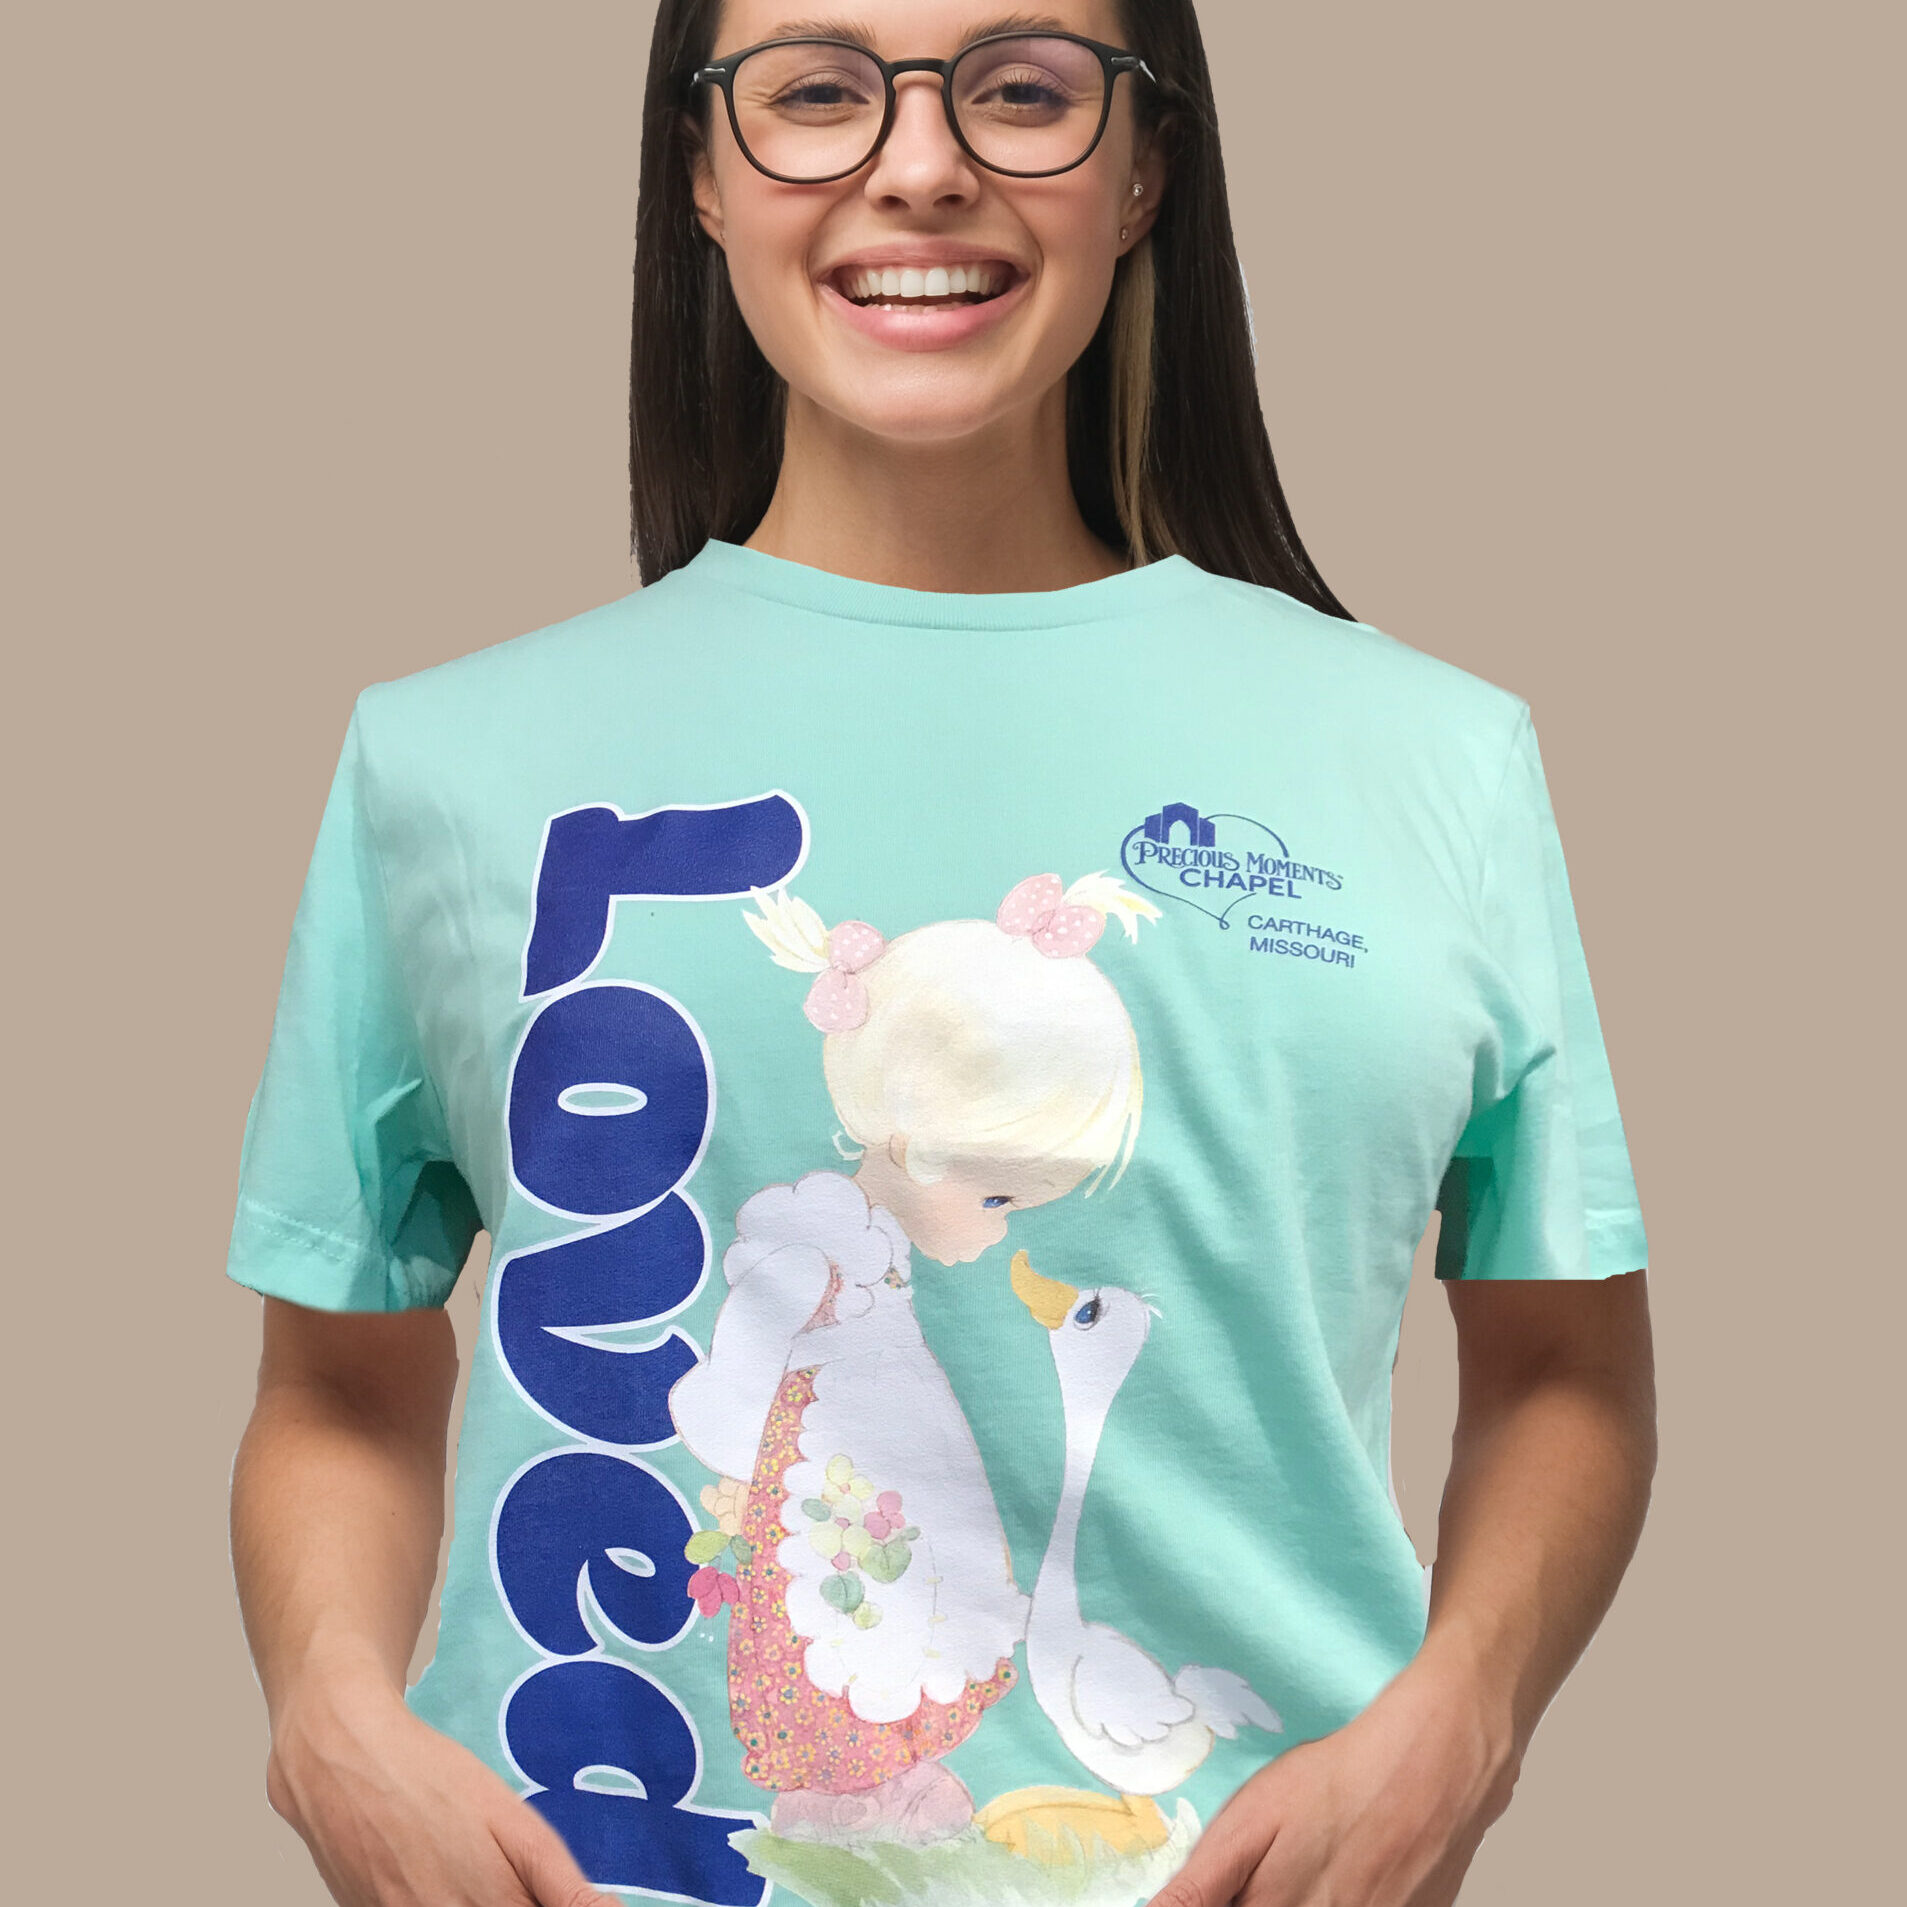 Teal Loved T-Shirt Make A Joyful Noise